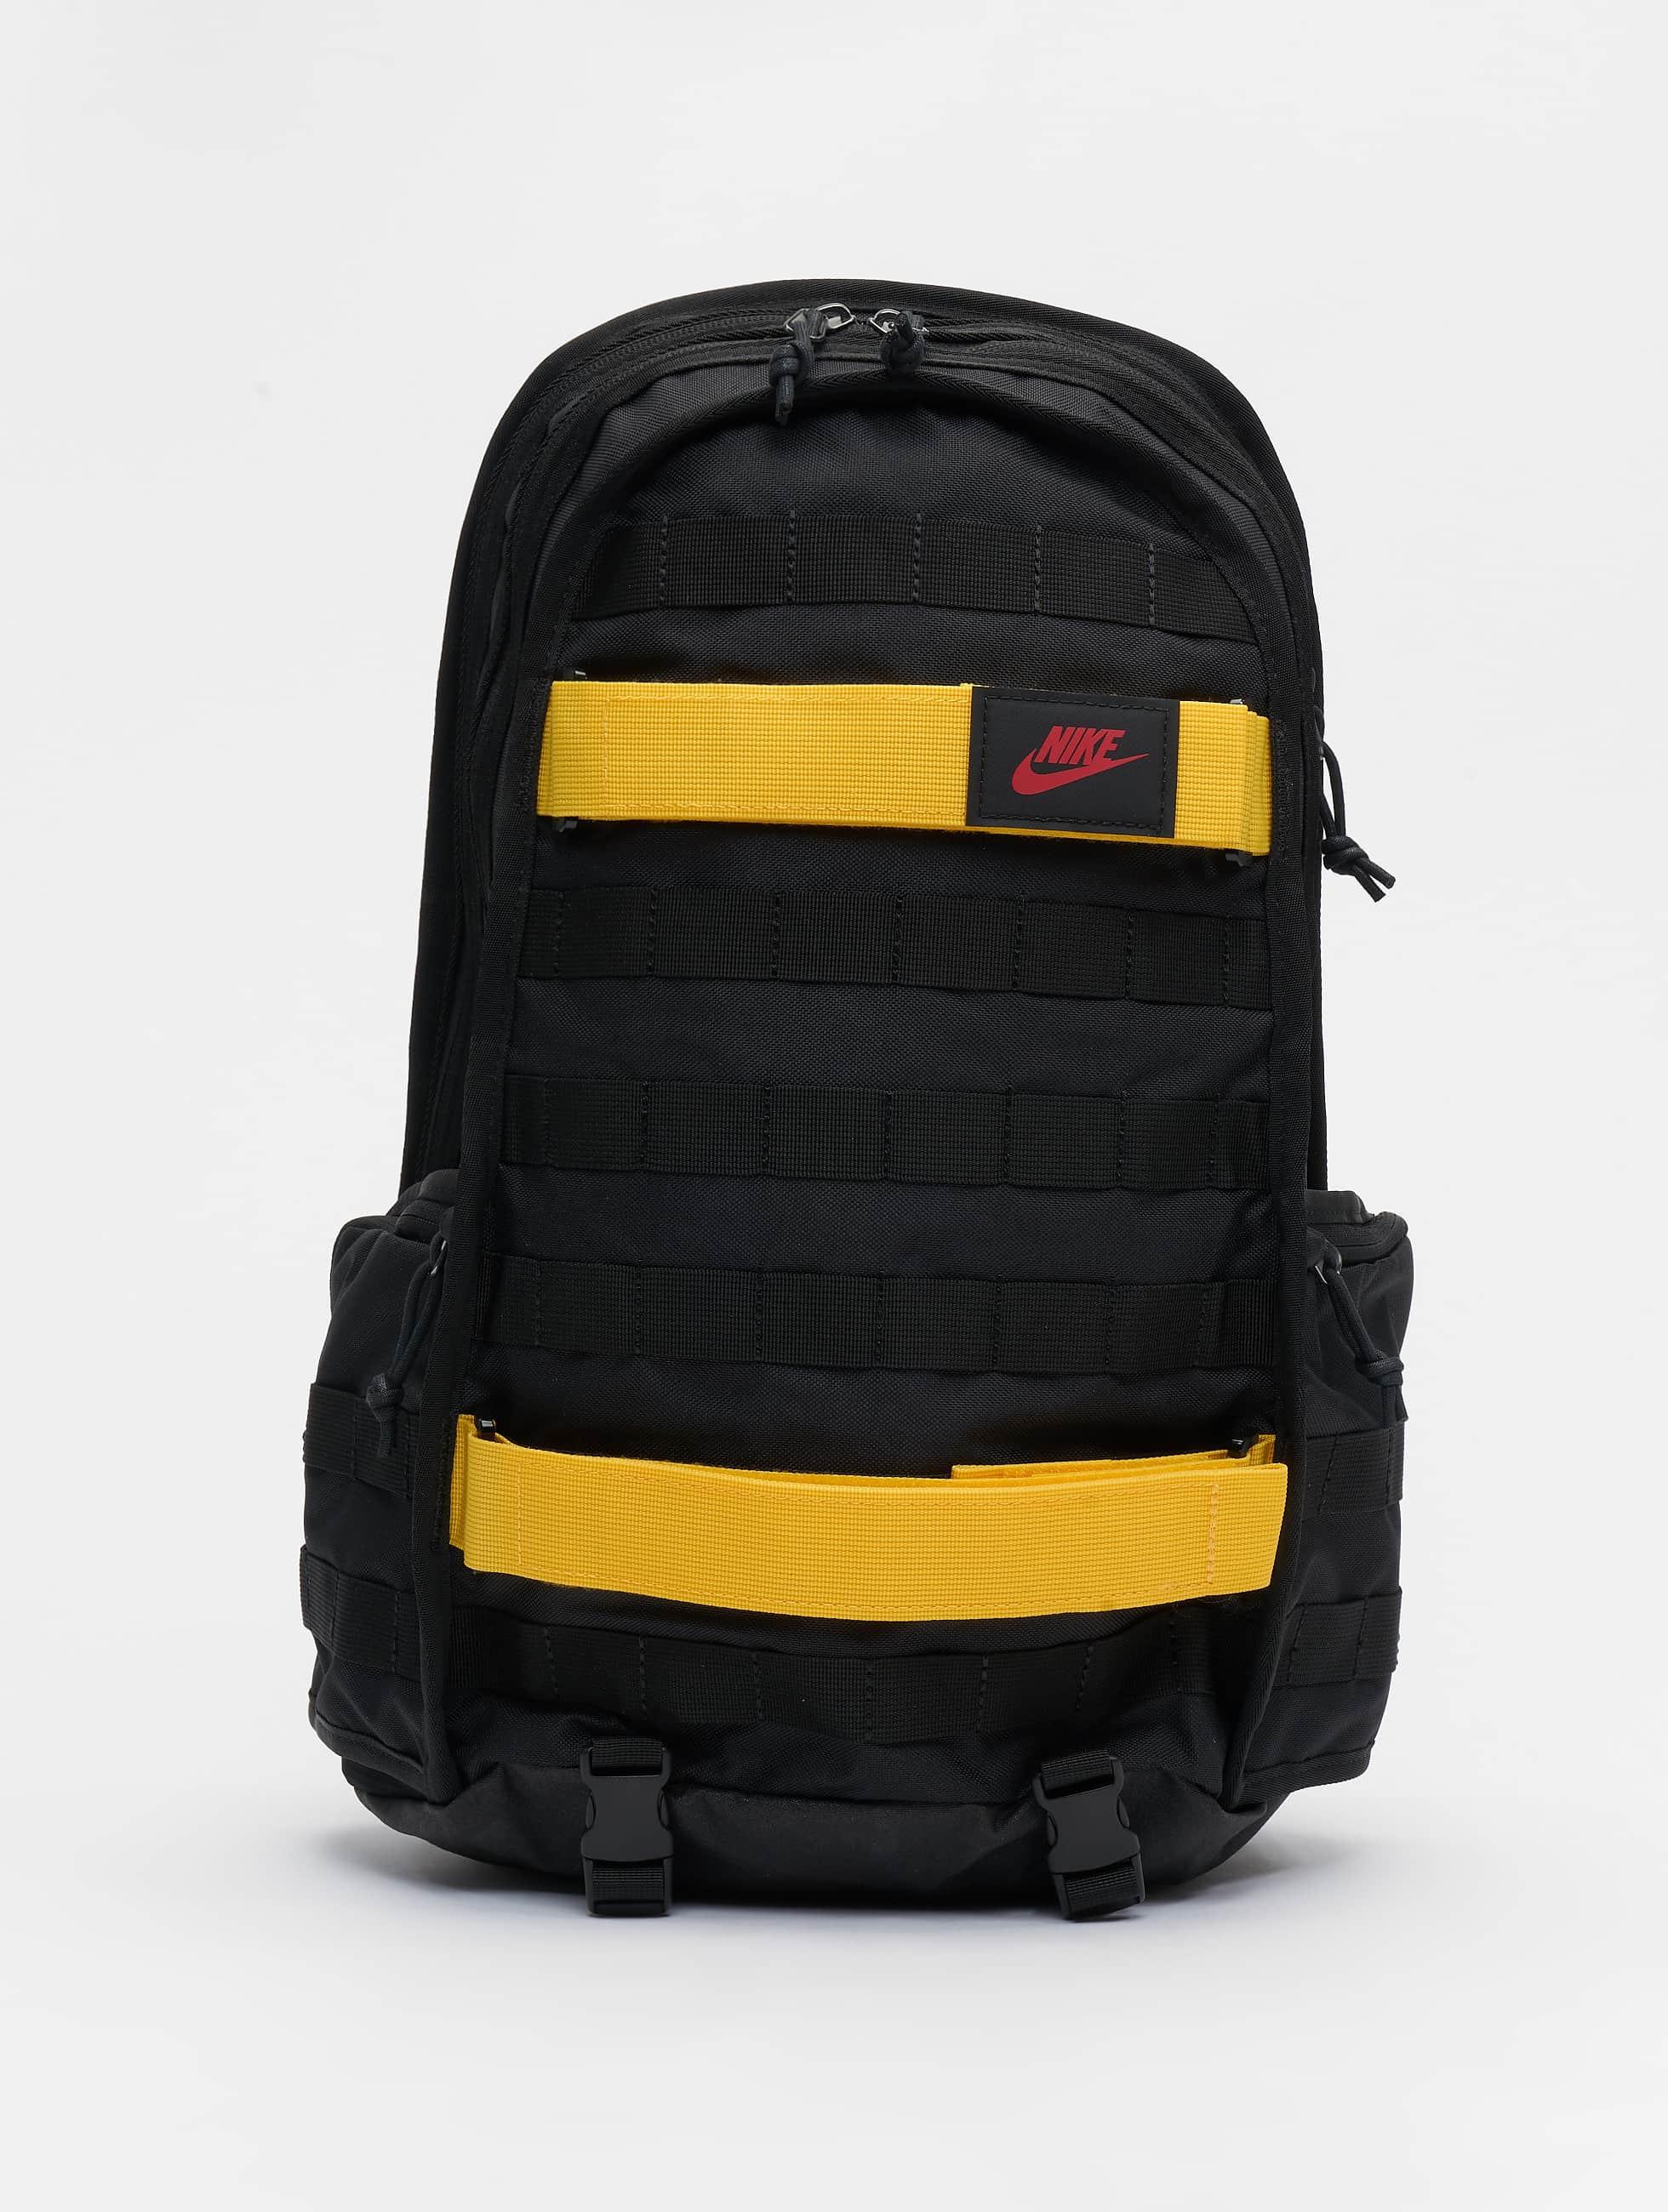 36b2bd14416 Nike SB Accessoires / rugzak RPM in zwart 669443